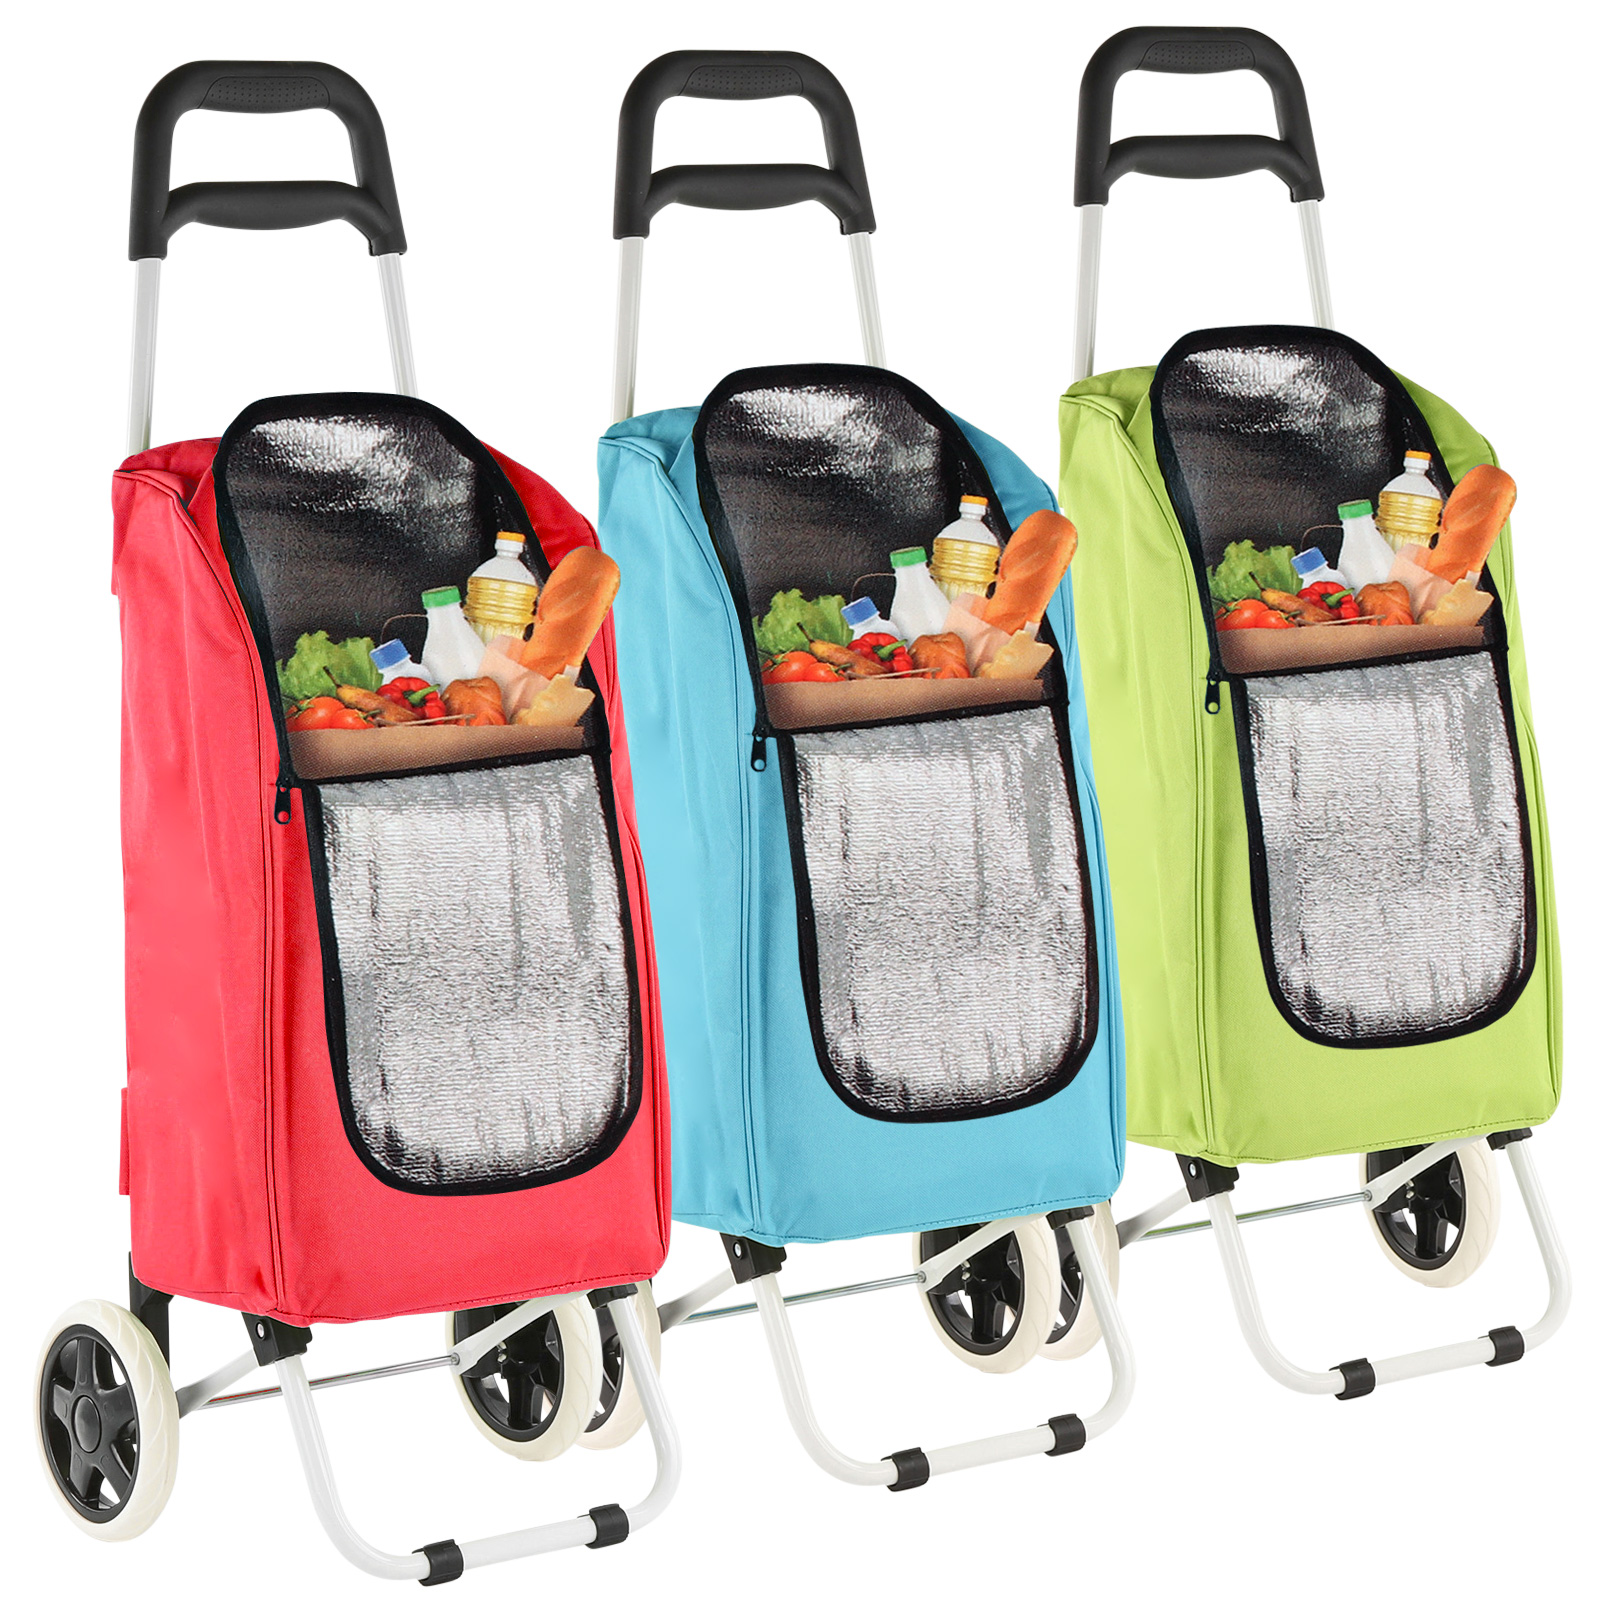 Trolley Shopping Trolley cooler bag 90x34,5x29cm 25Ltr foldable